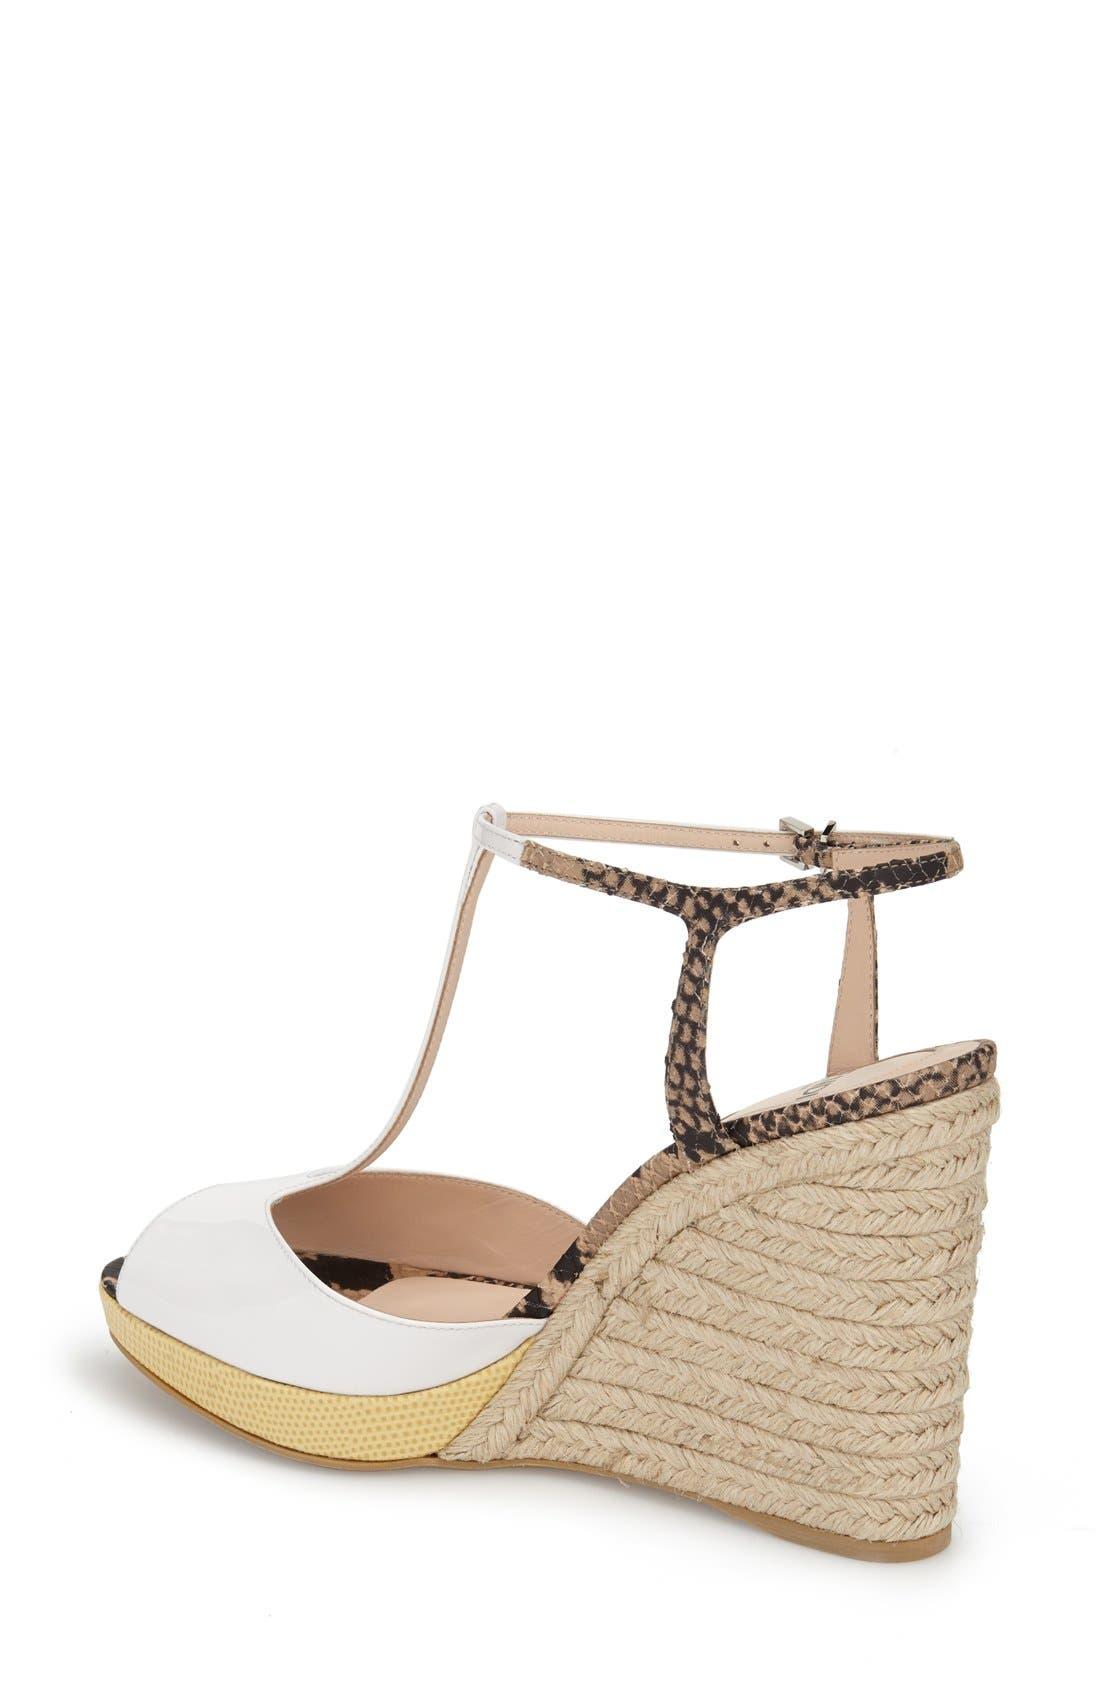 'Elodie' T-Strap Wedge Sandal,                             Alternate thumbnail 6, color,